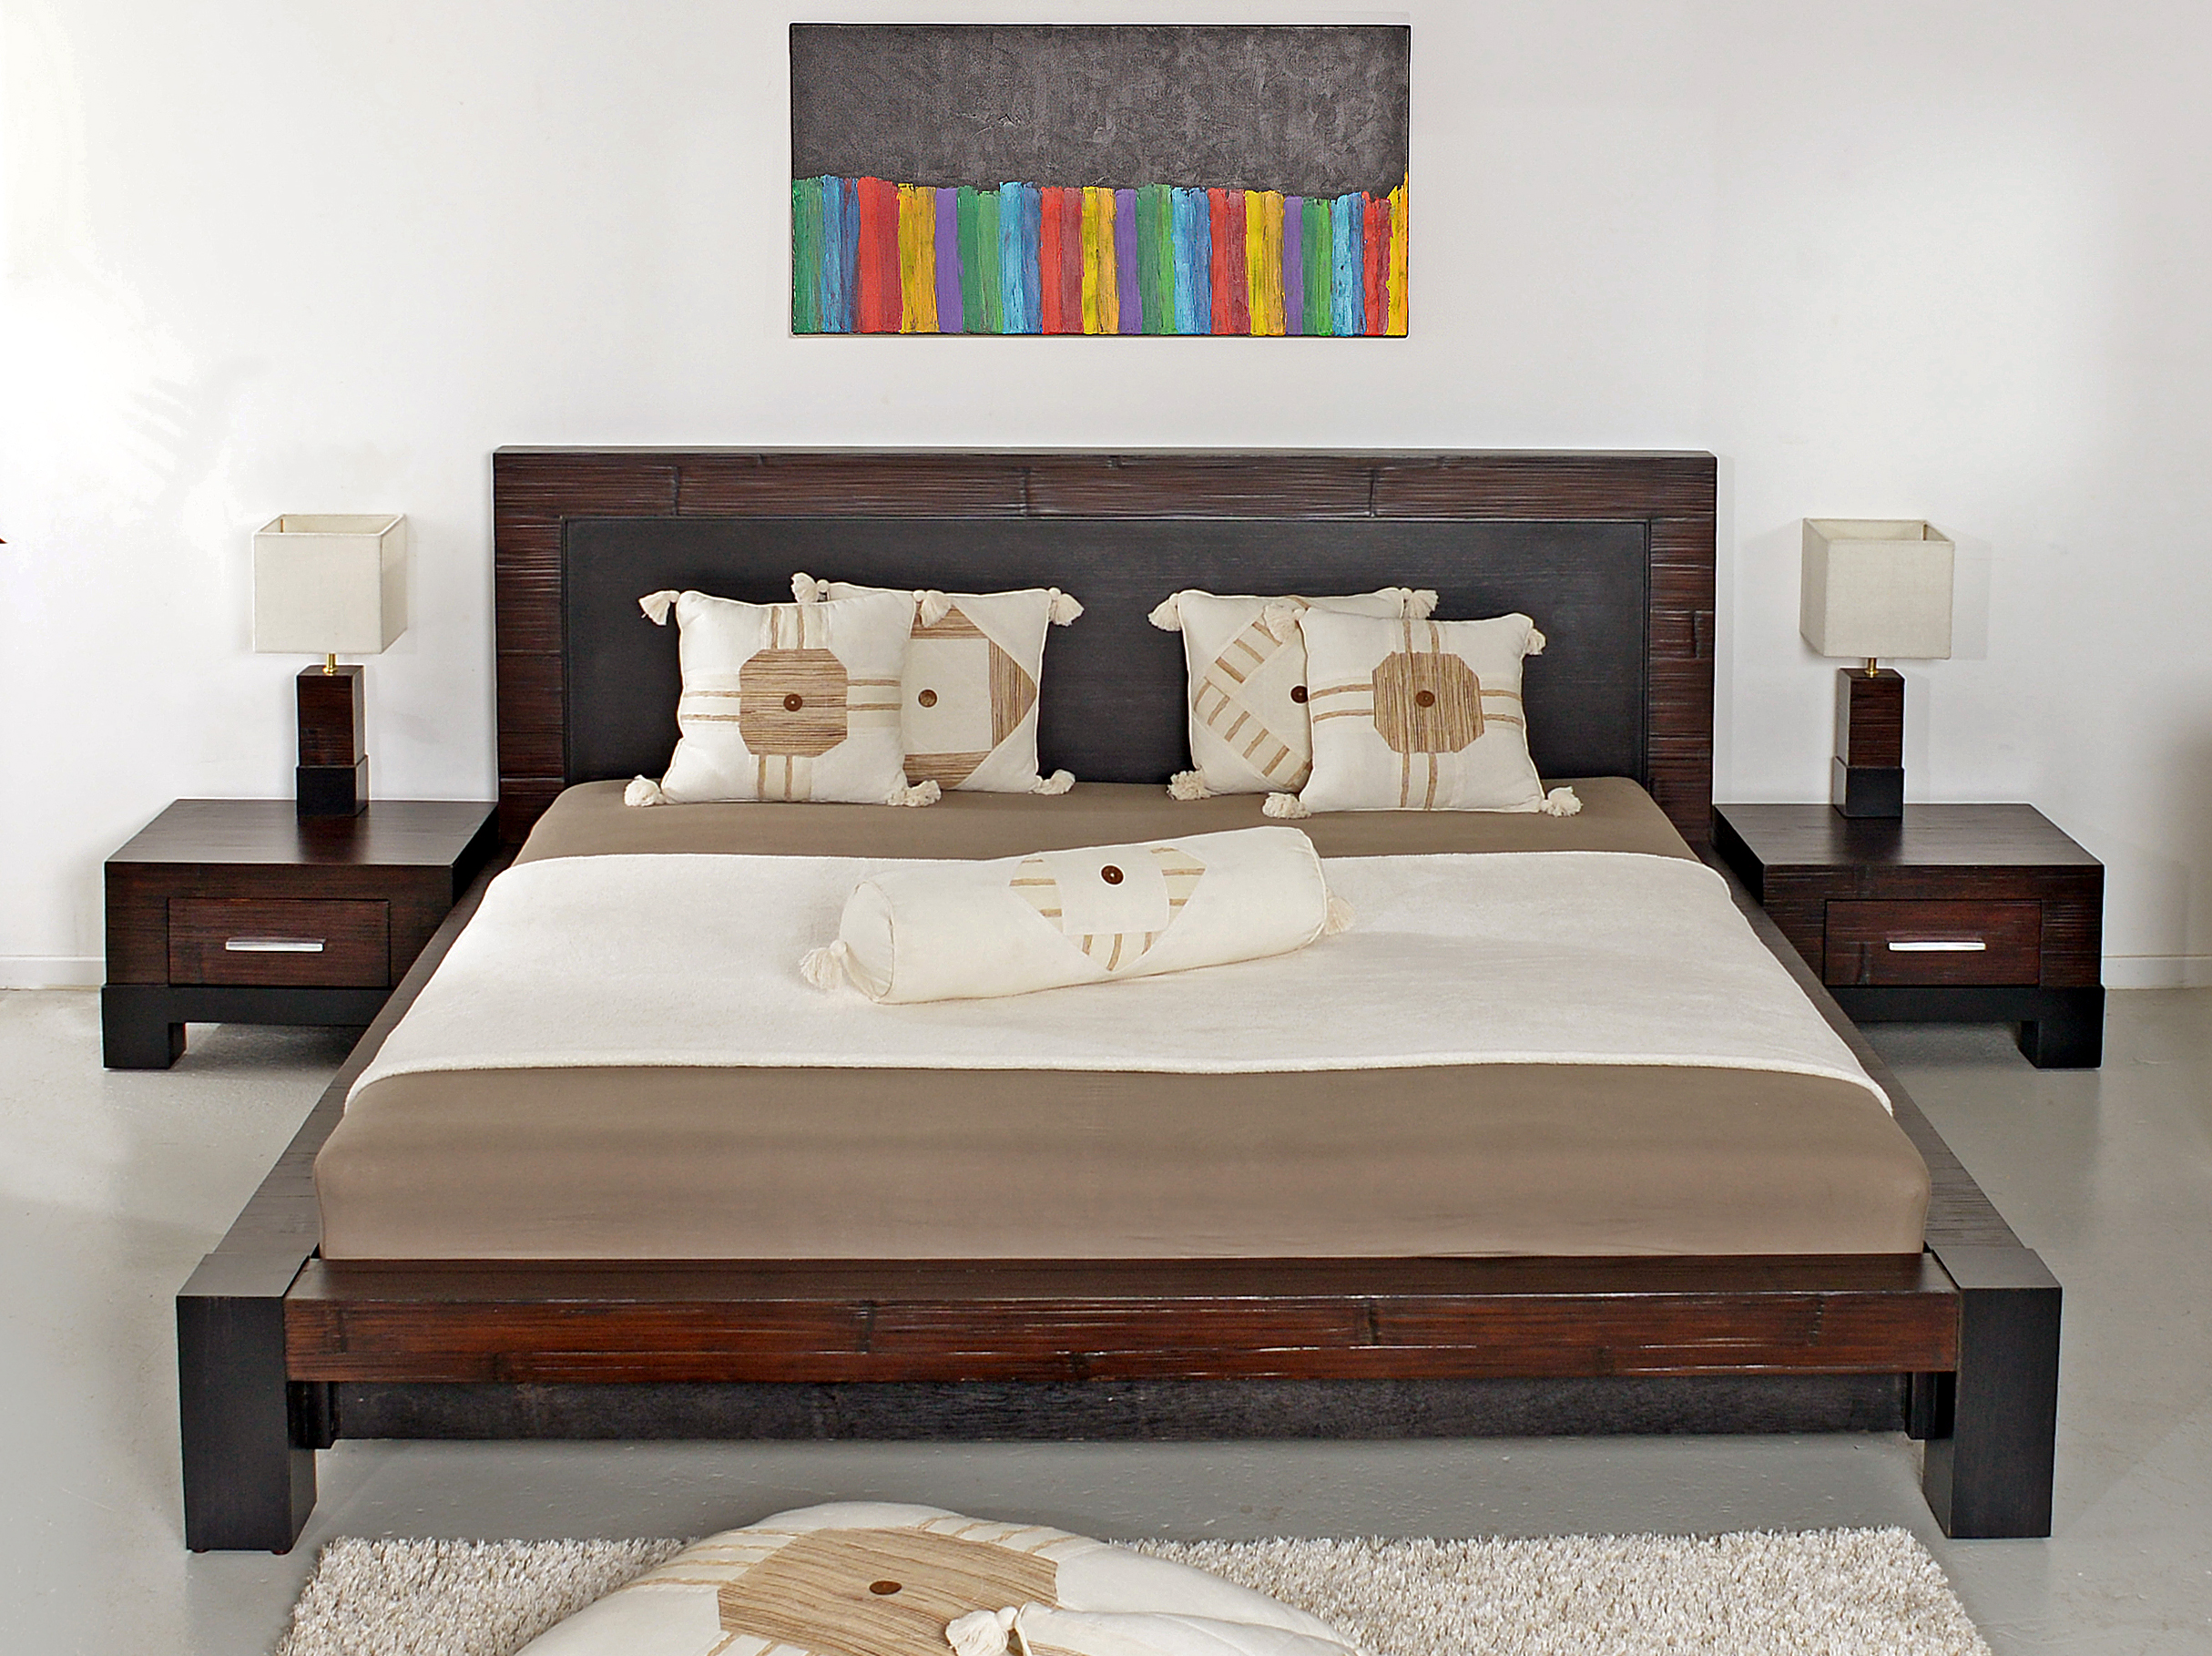 180x200 interesting schn bett x mit bettkasten maintal. Black Bedroom Furniture Sets. Home Design Ideas